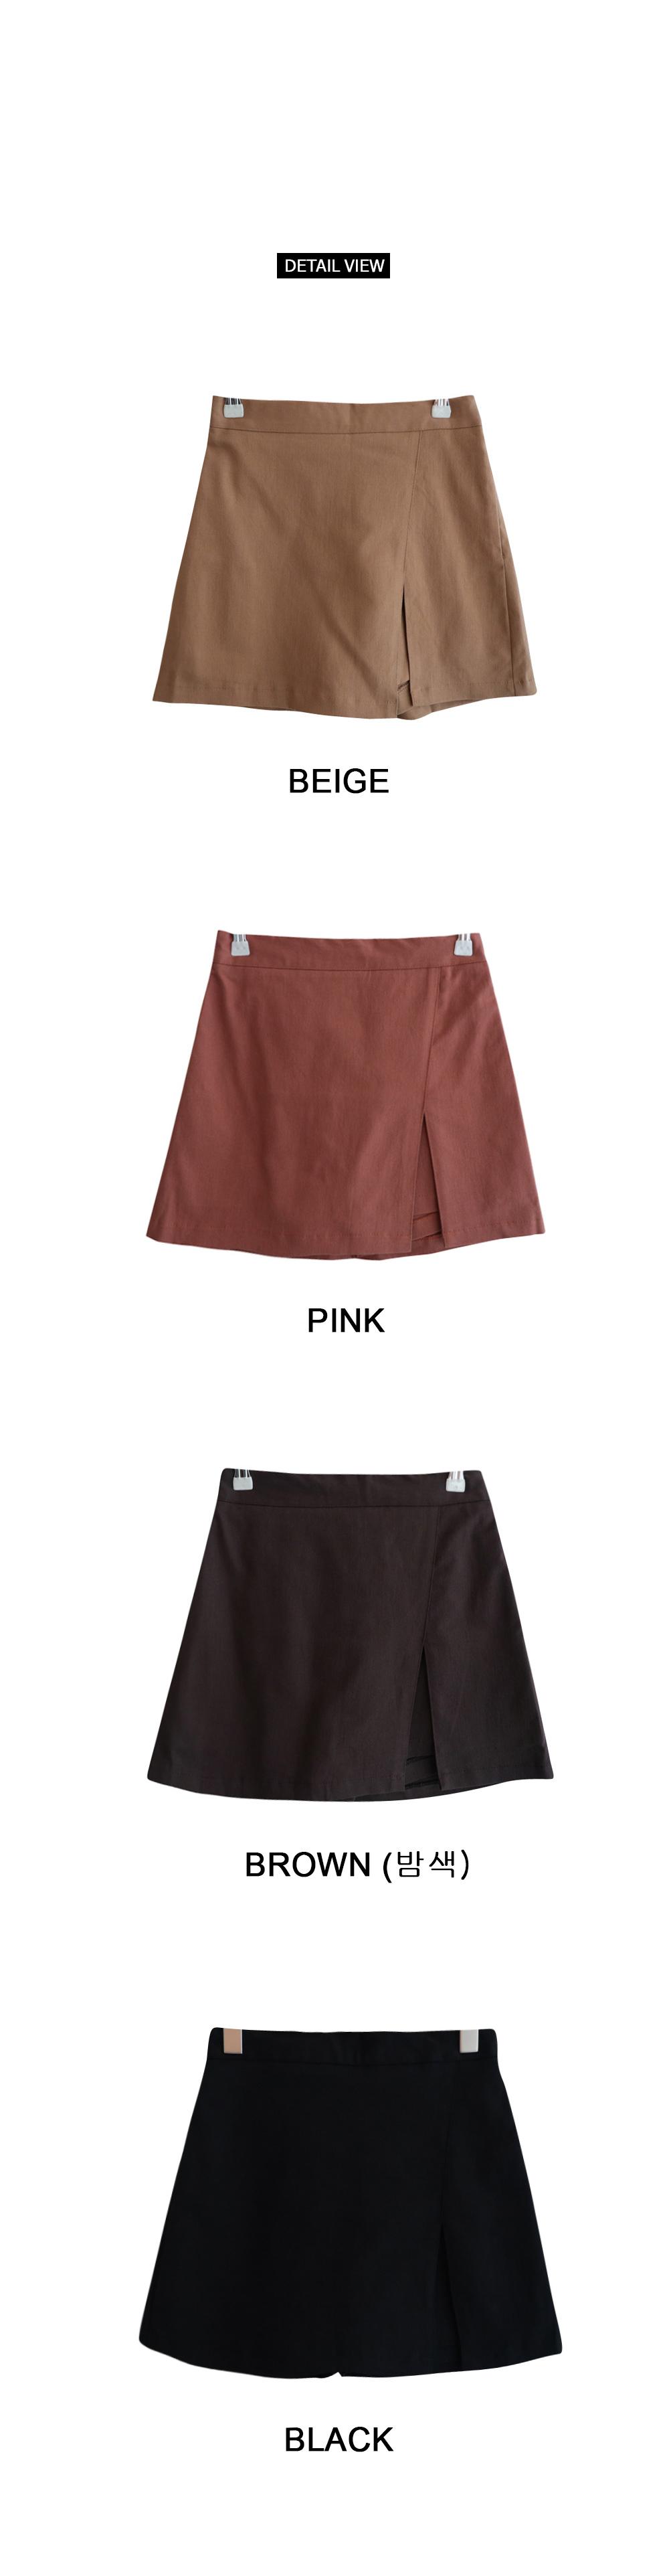 Cotton trim mini skirt